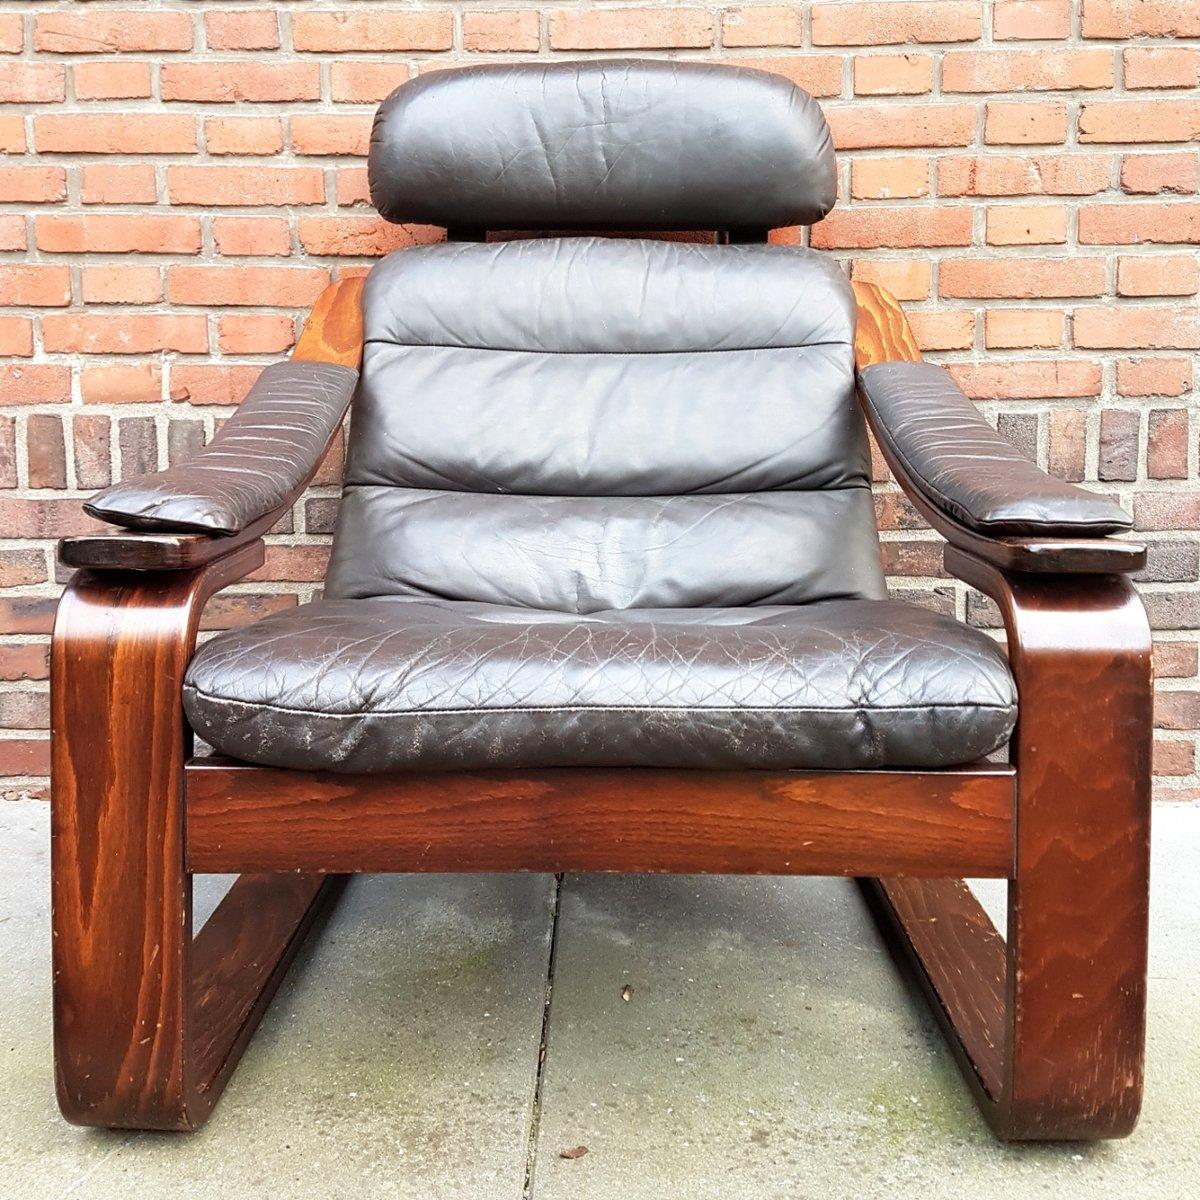 Bentwood lounge chair - Bentwood Lounge Chair 10